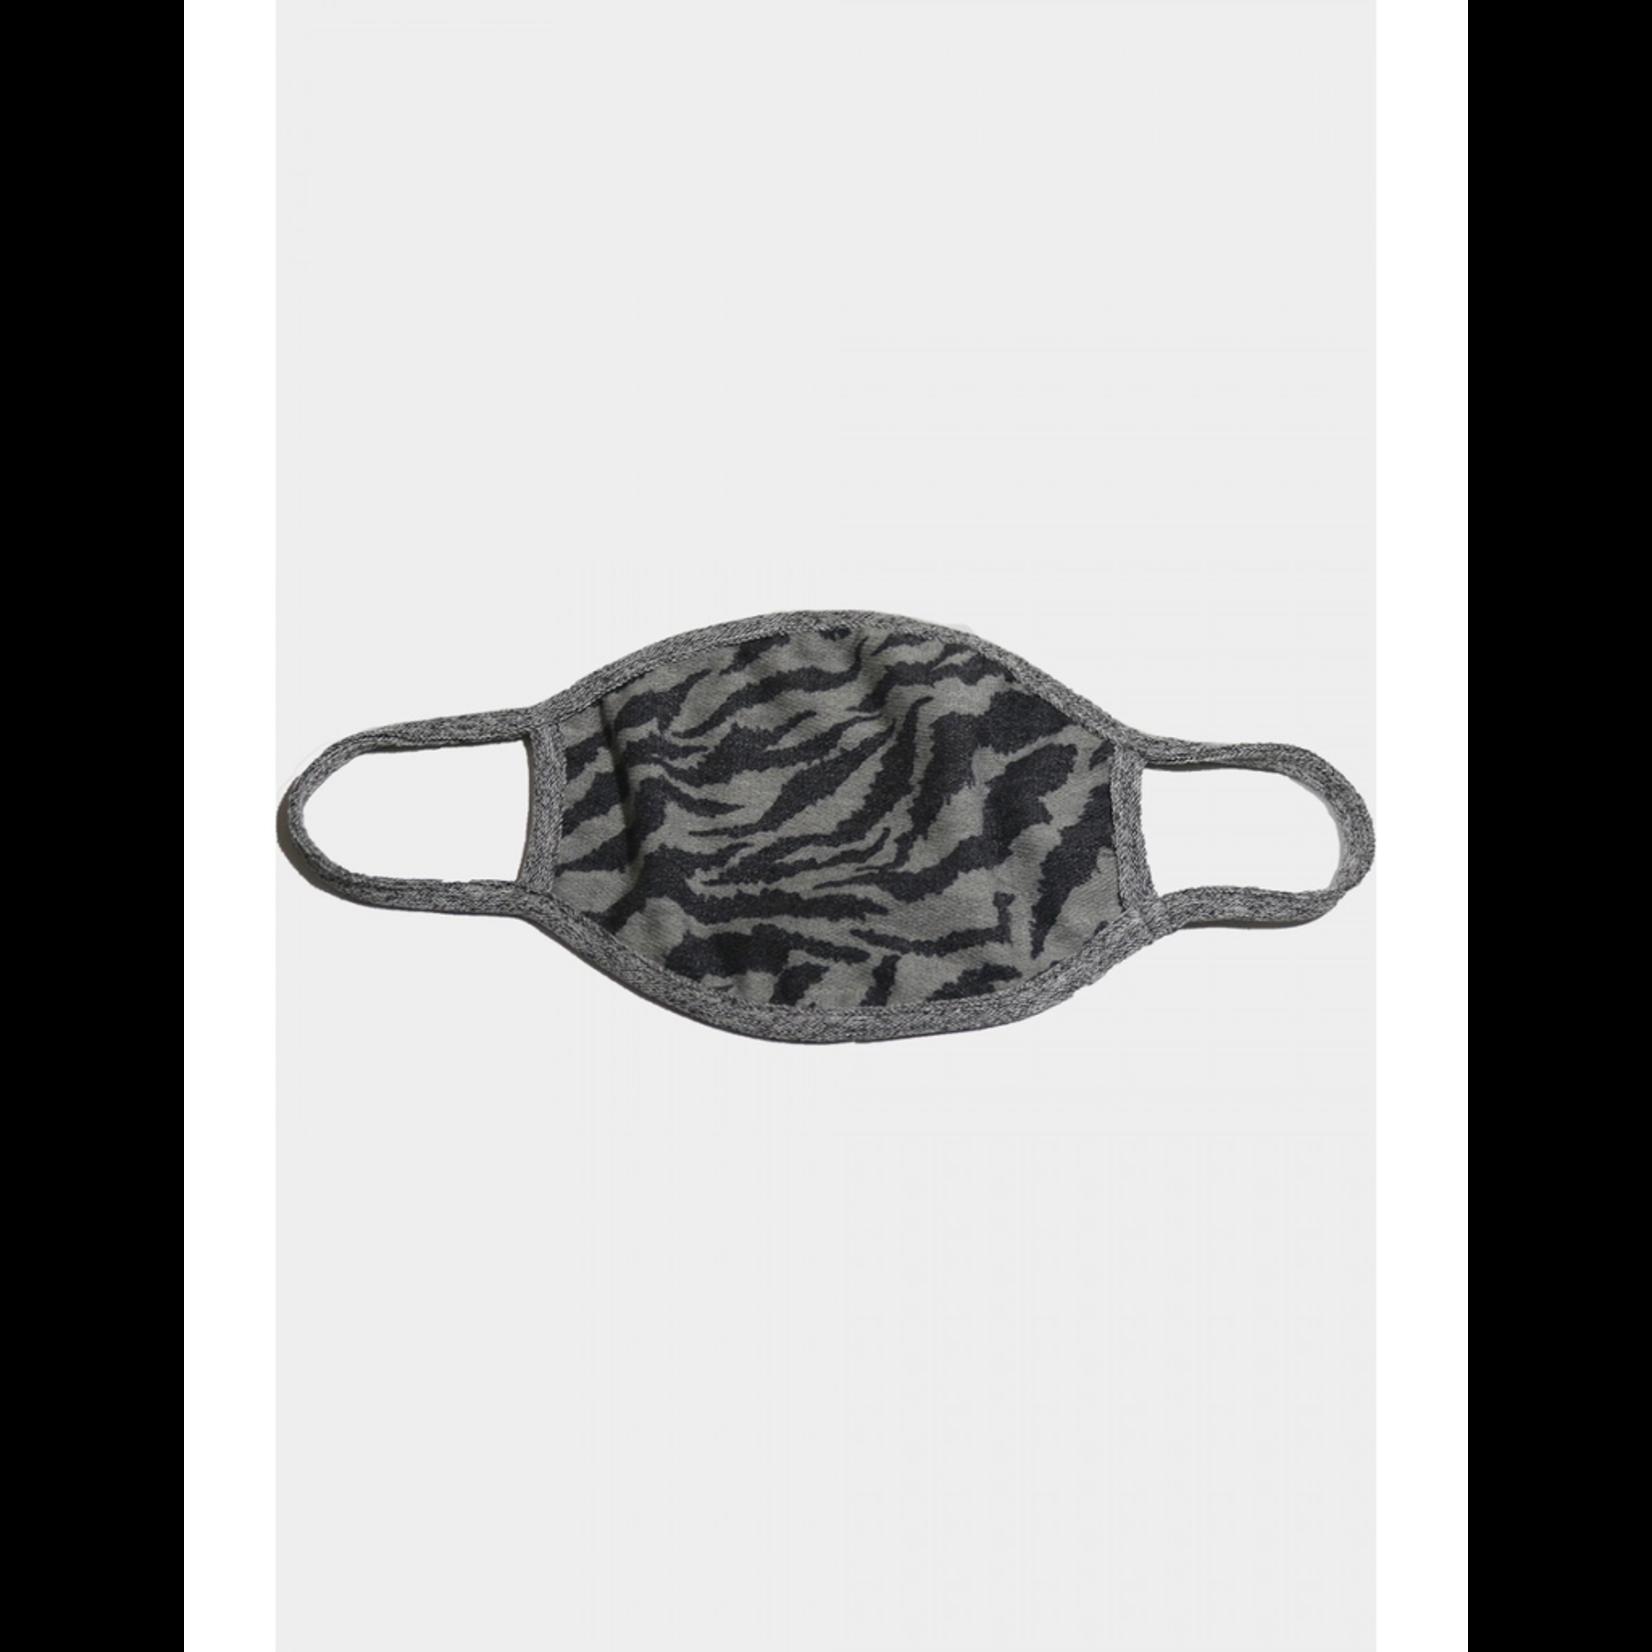 Coin 1804 Cozy Mask Zebra